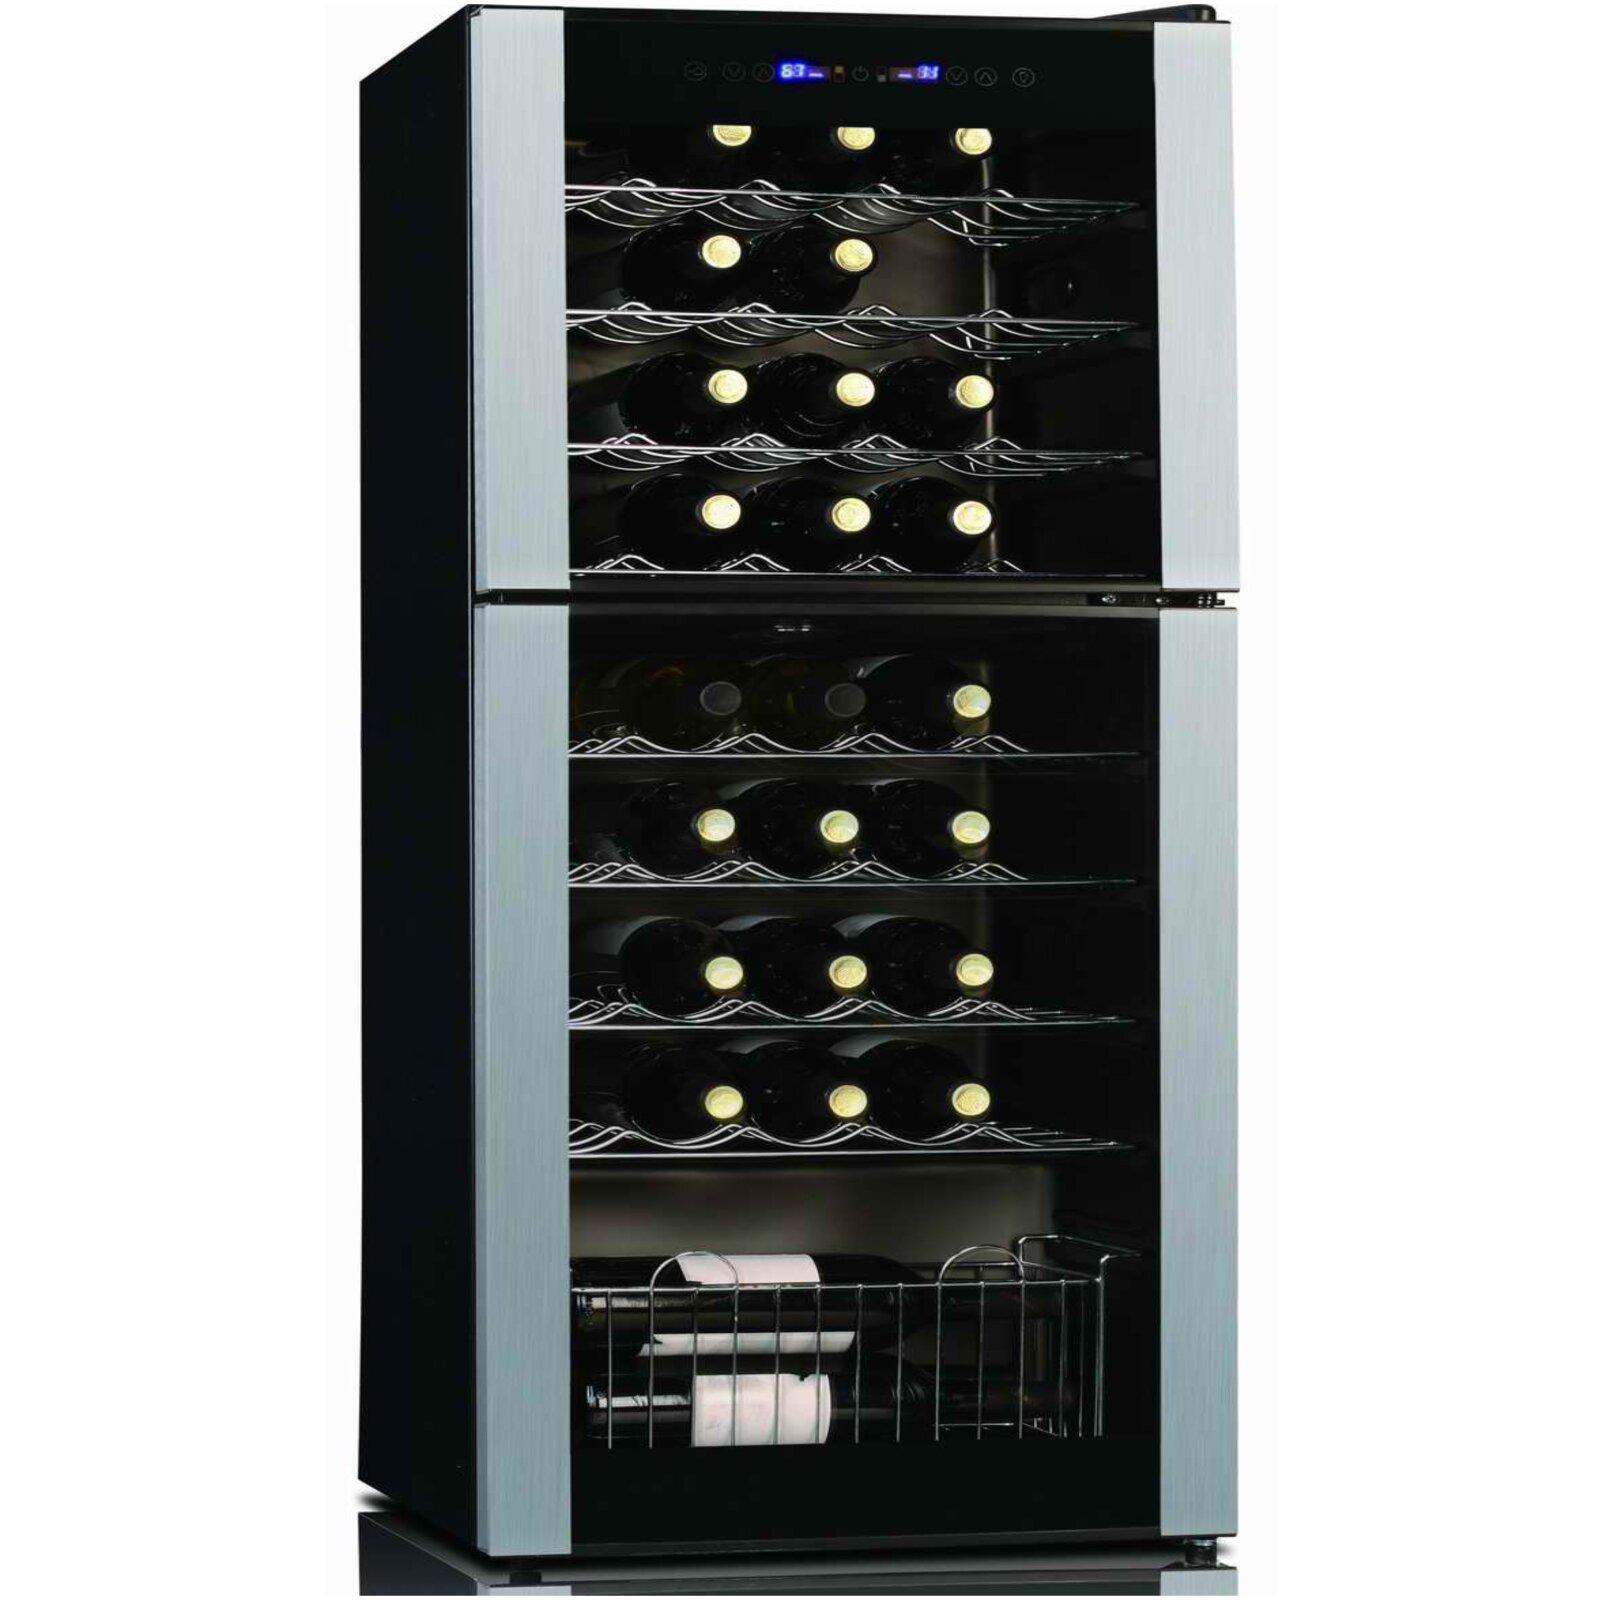 Koolatron Koolatron 45 Bottle Dual Zone Freestanding Wine